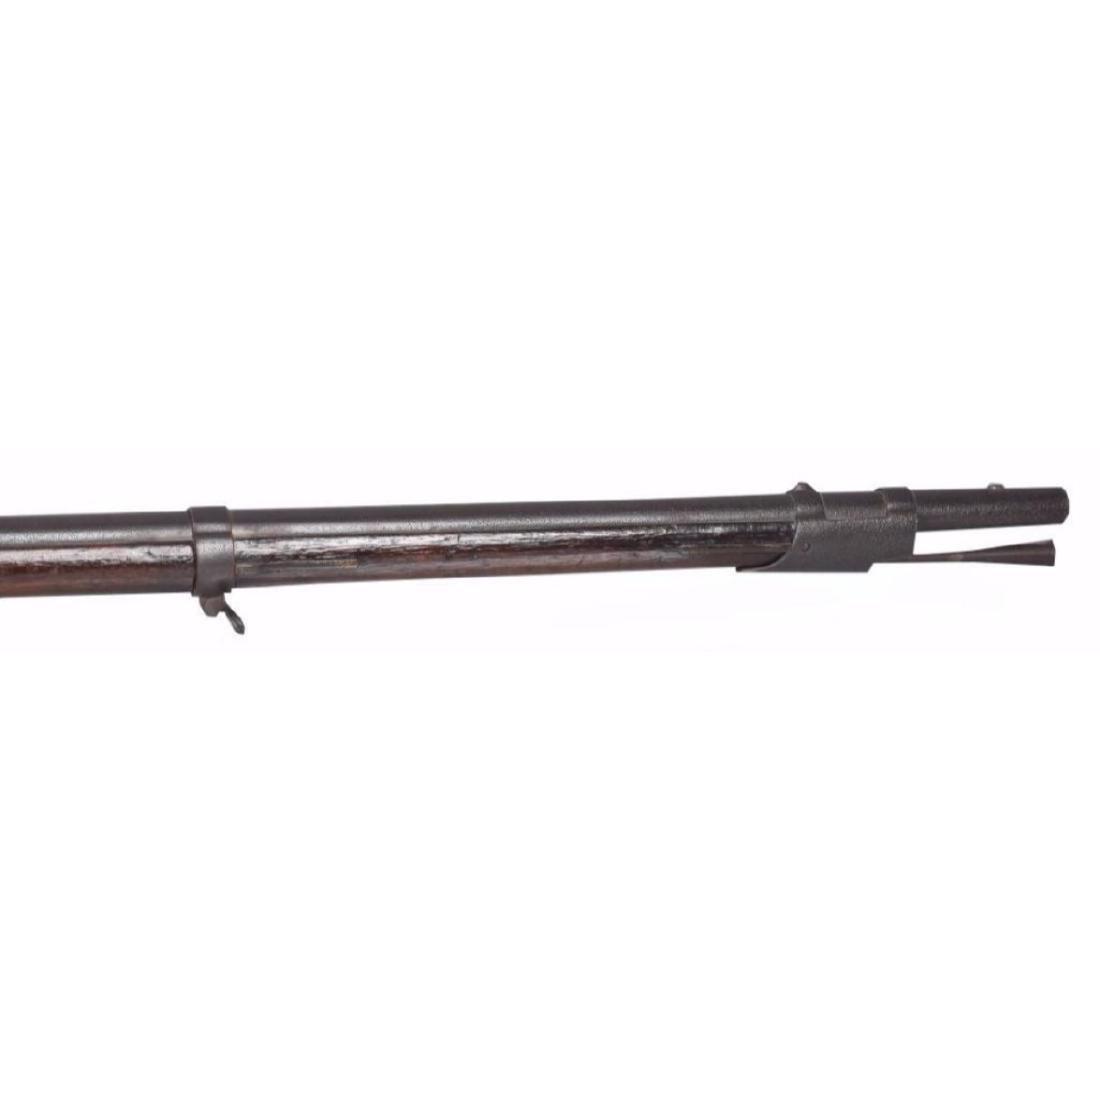 Rare U.S. 1816 HARPERS FERRY .69 caliber MUSKET - 8